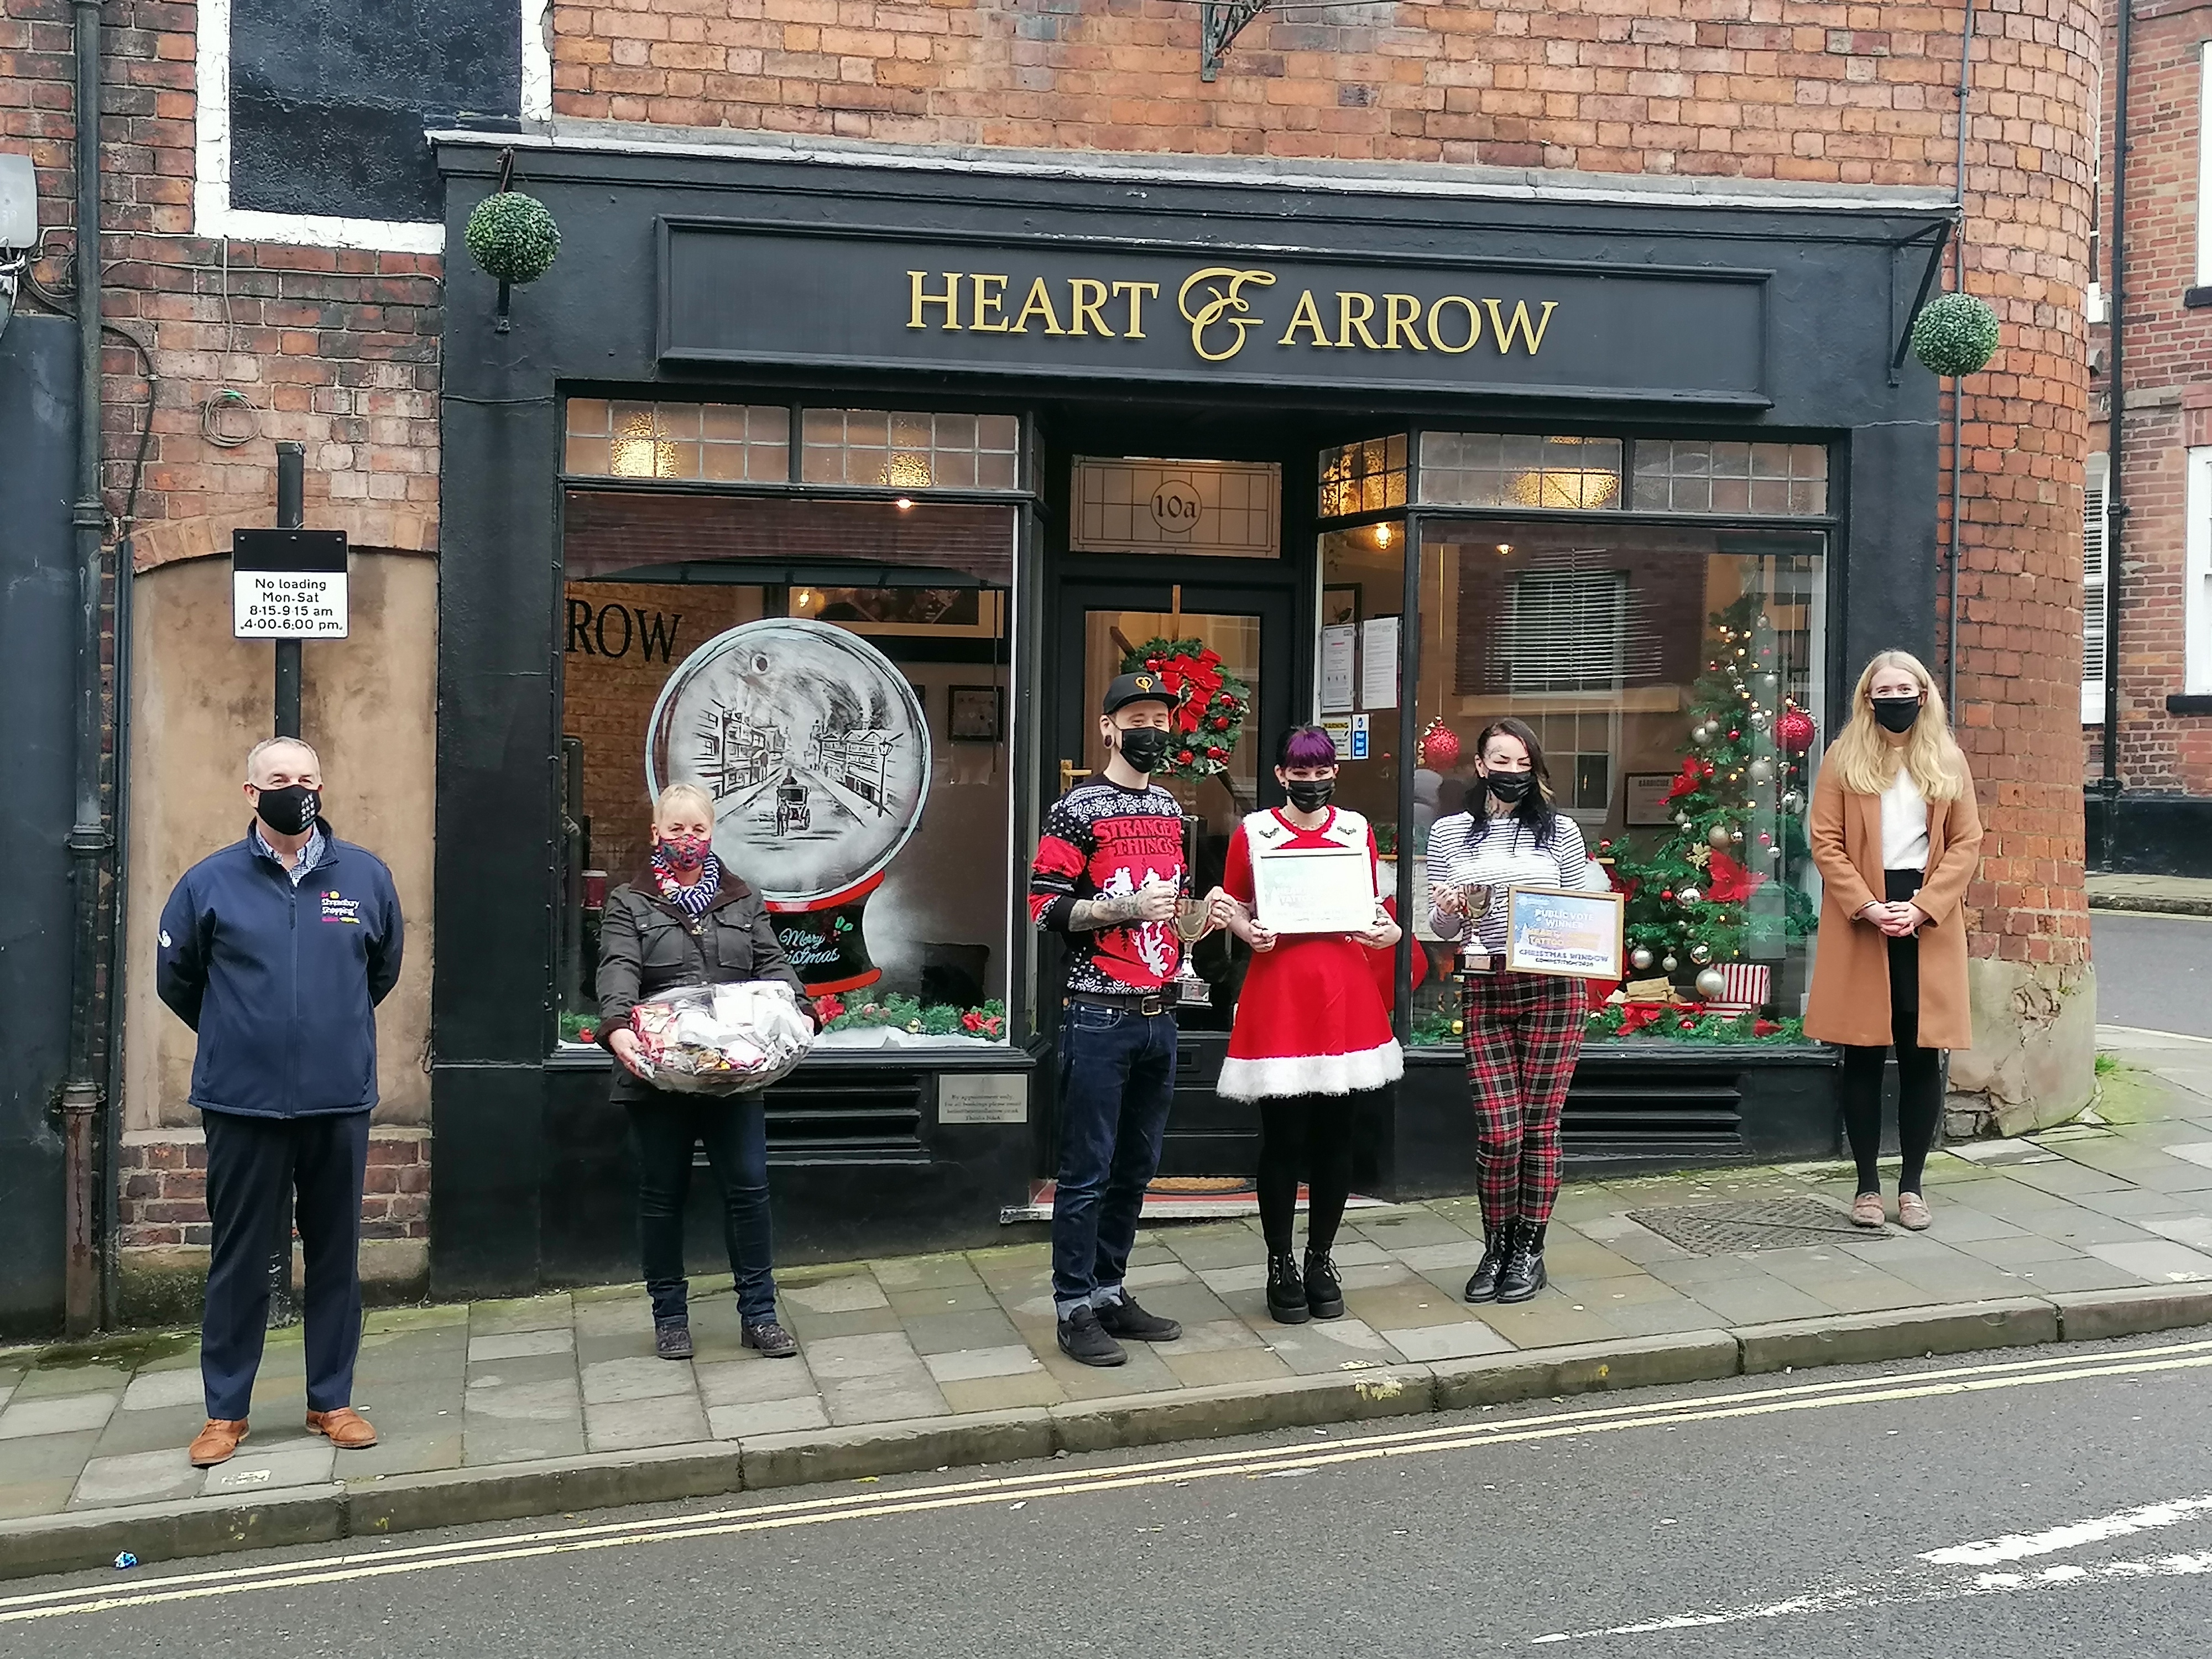 Christmas windows celebrated in Shrewsbury